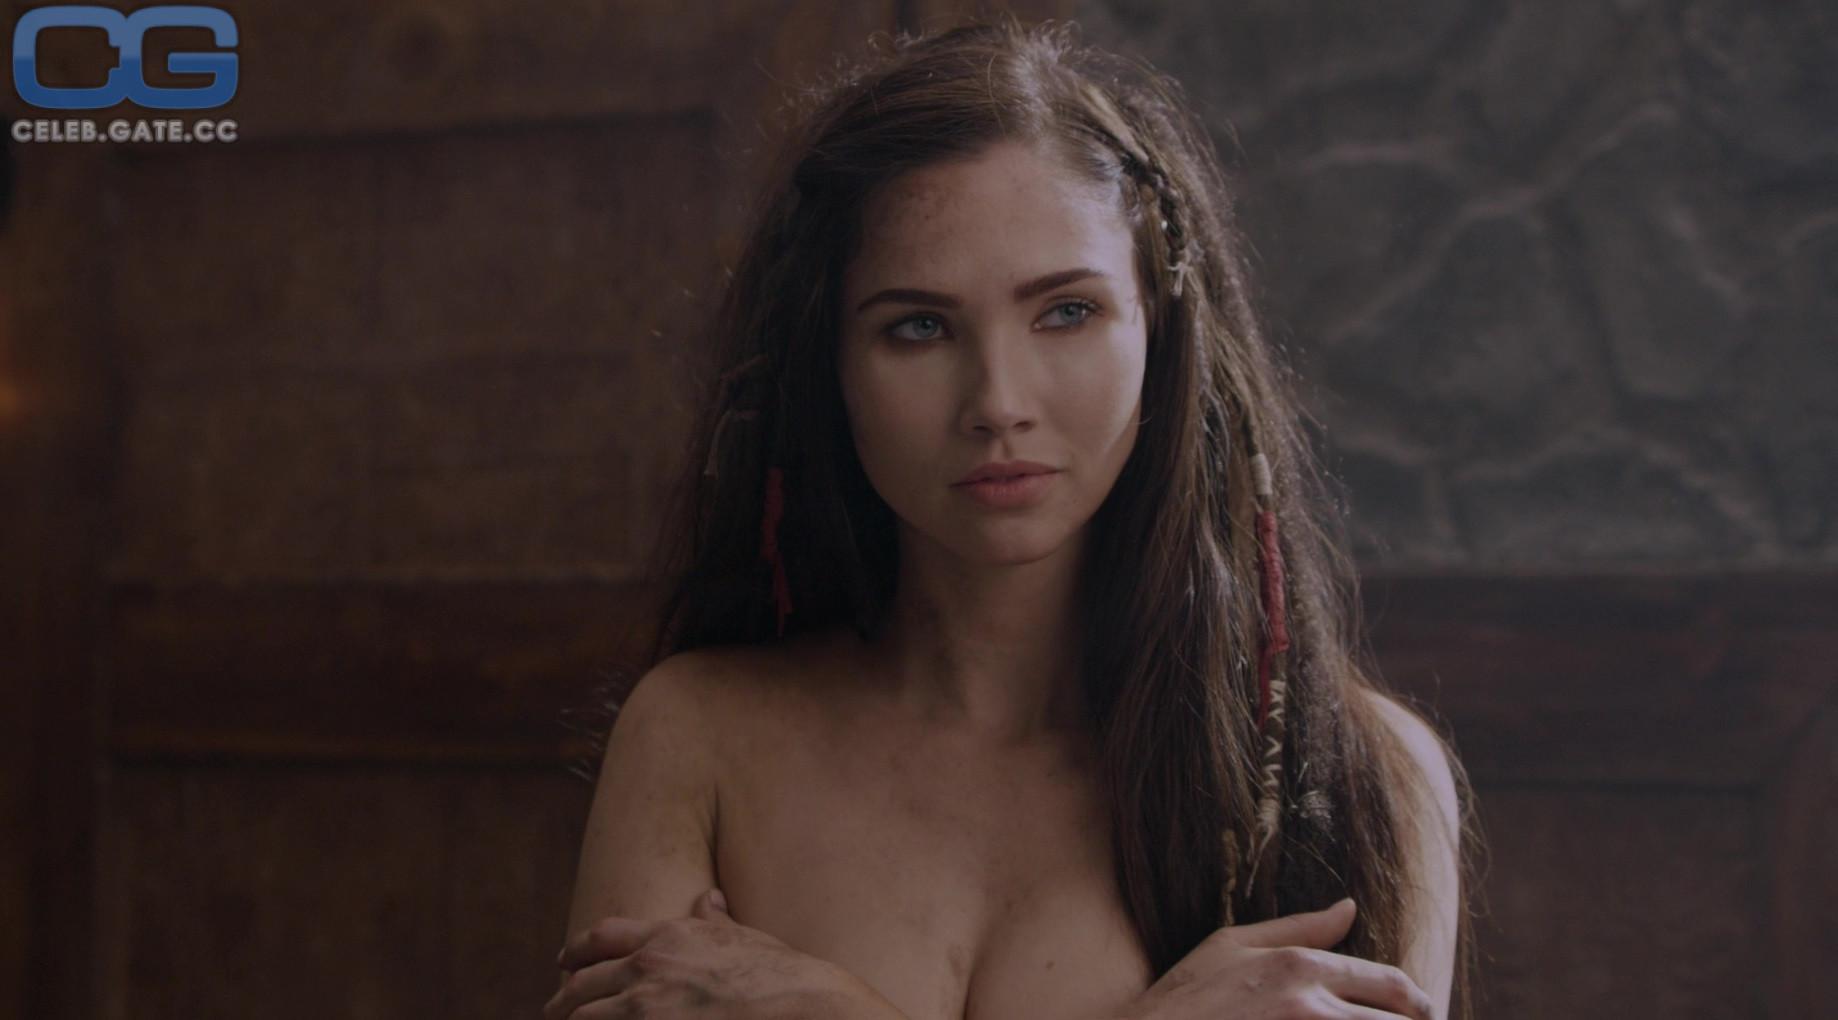 Jessica nackt Alexander Outcry after